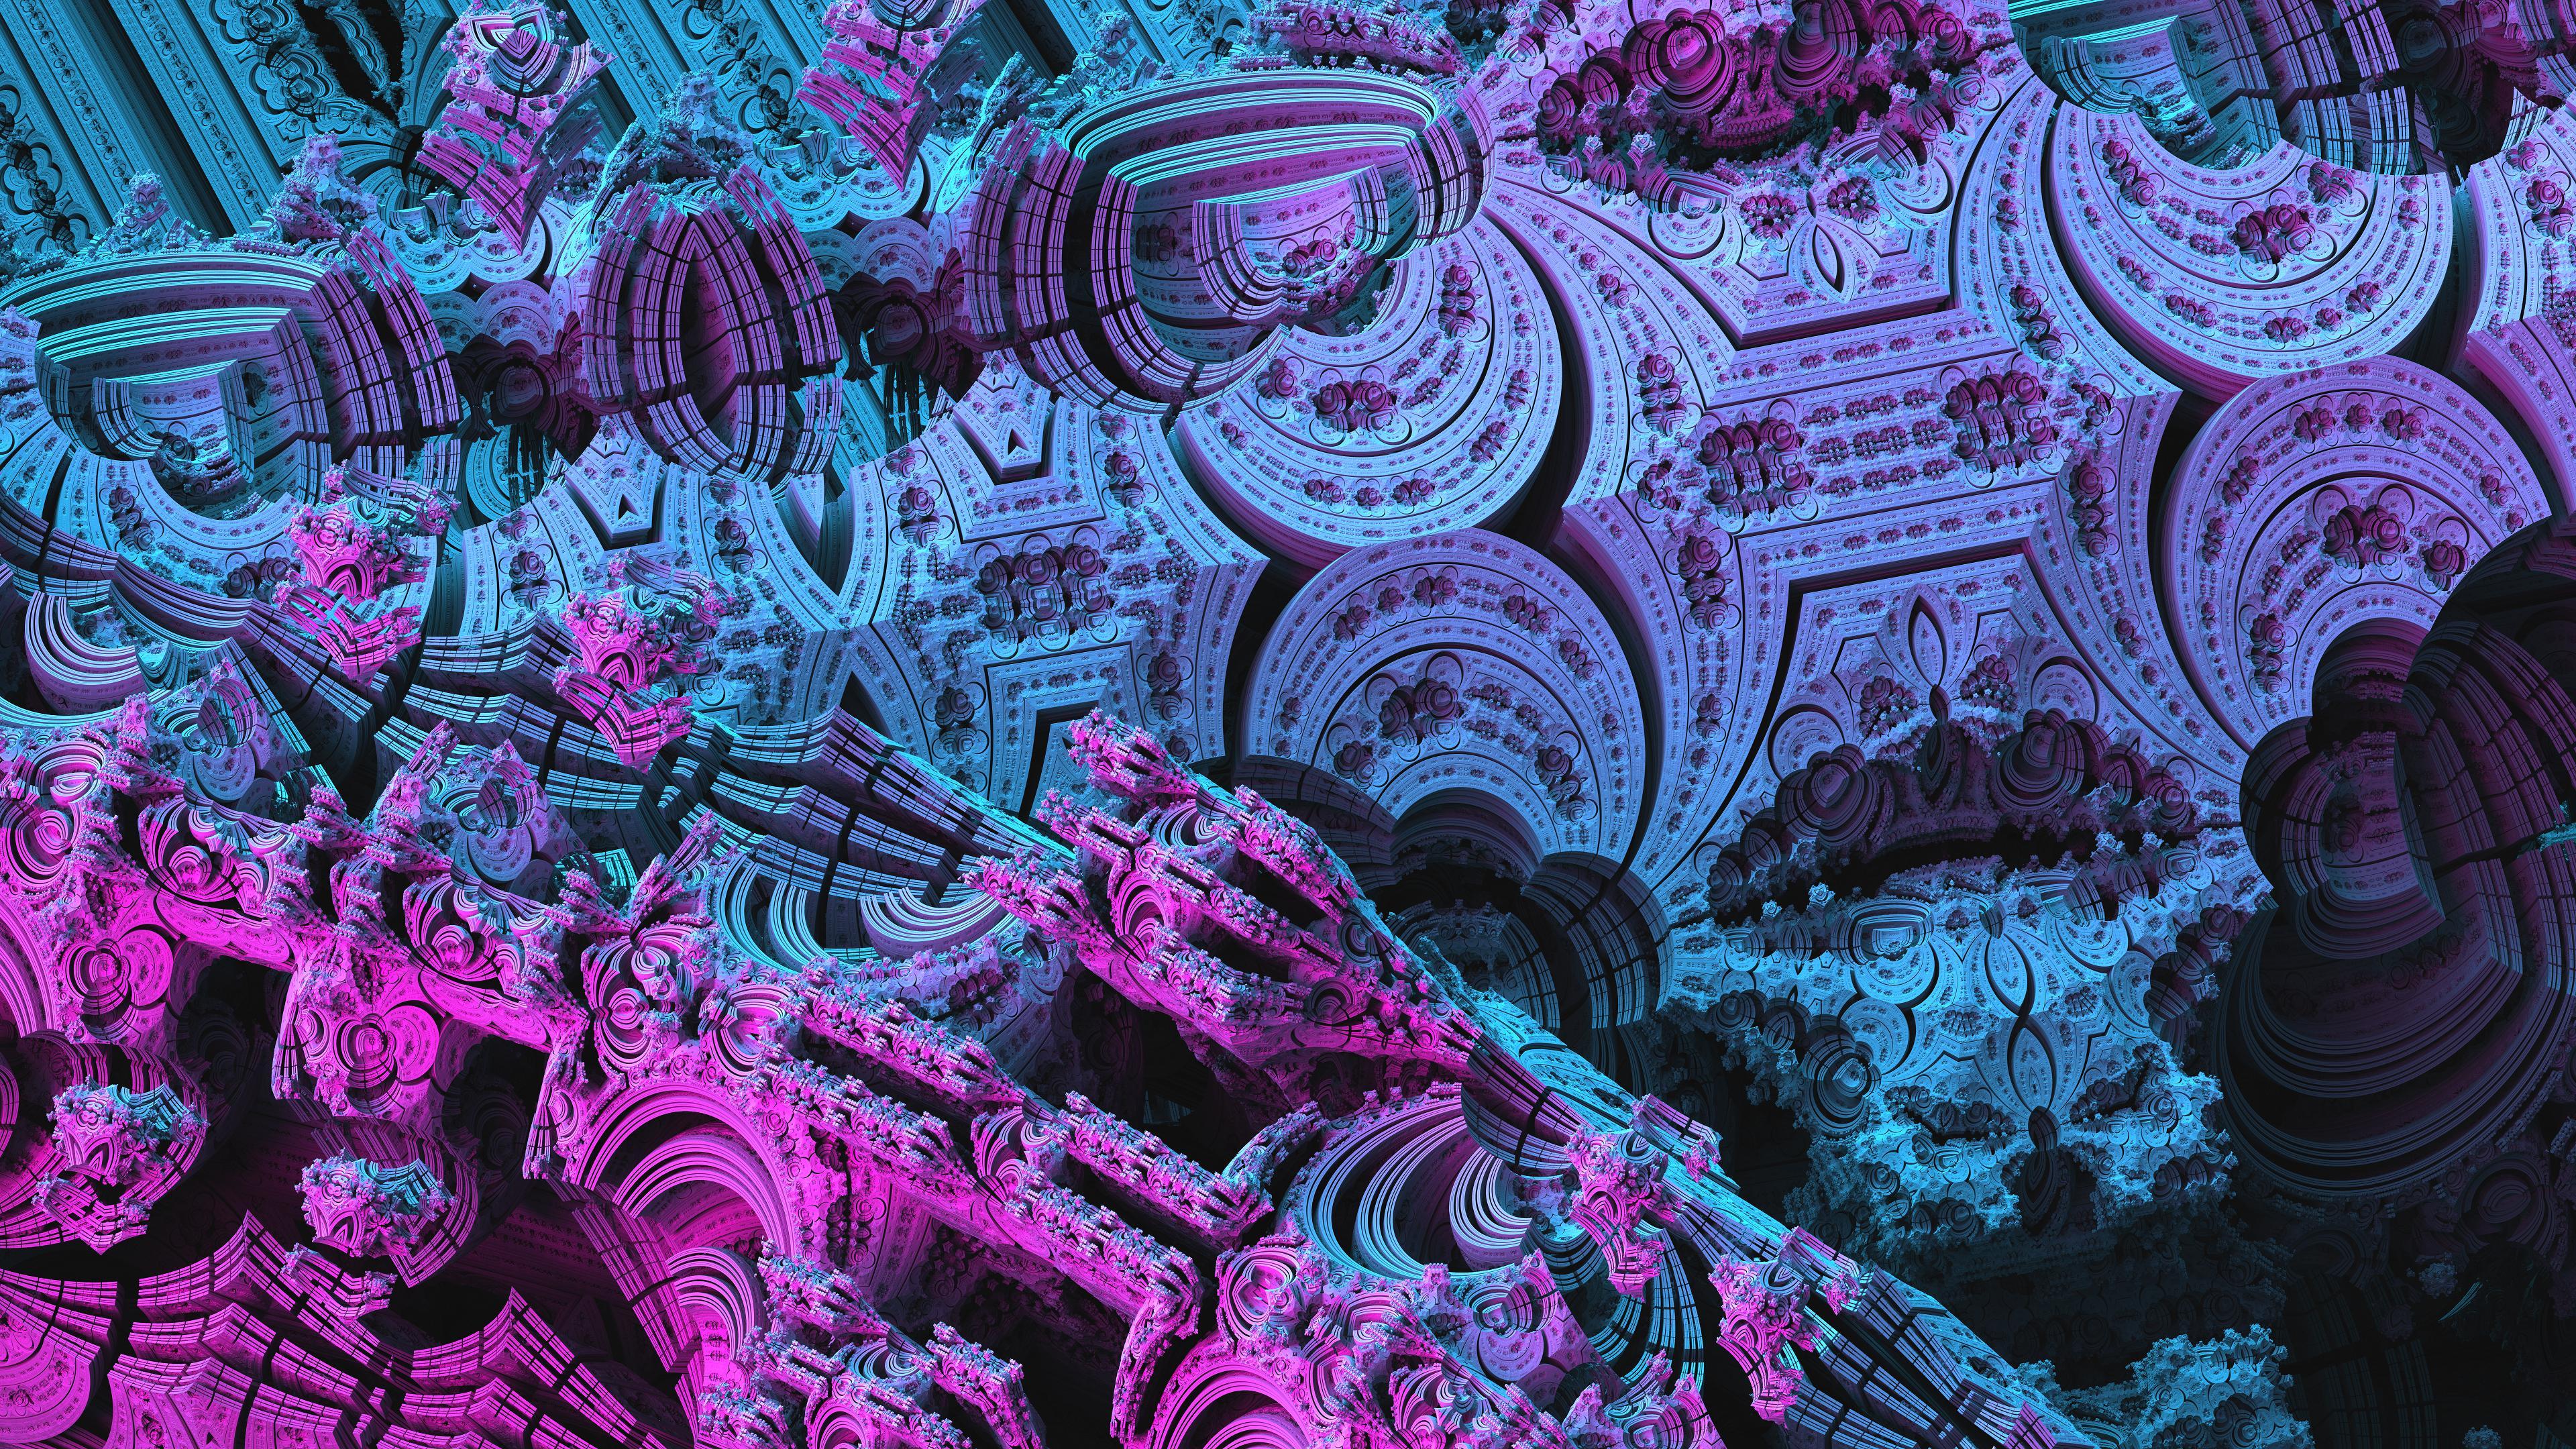 3D Fractal Wallpapers   Album on Imgur 3840x2160